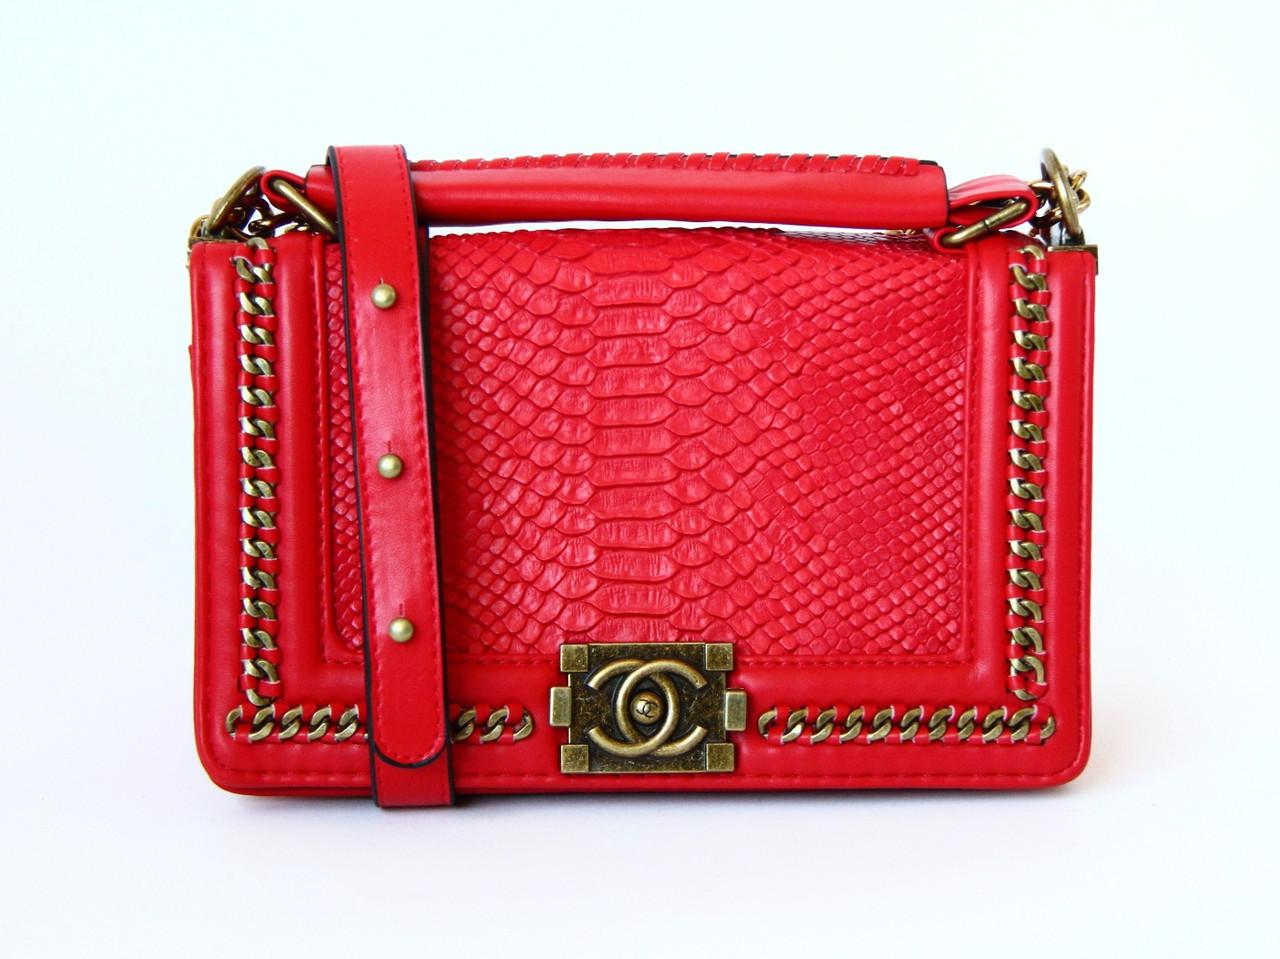 Сумка на плечо копия красная Chanel Boy ( Шанель Бой), цена 1 450 ... cb2cf45fdbb